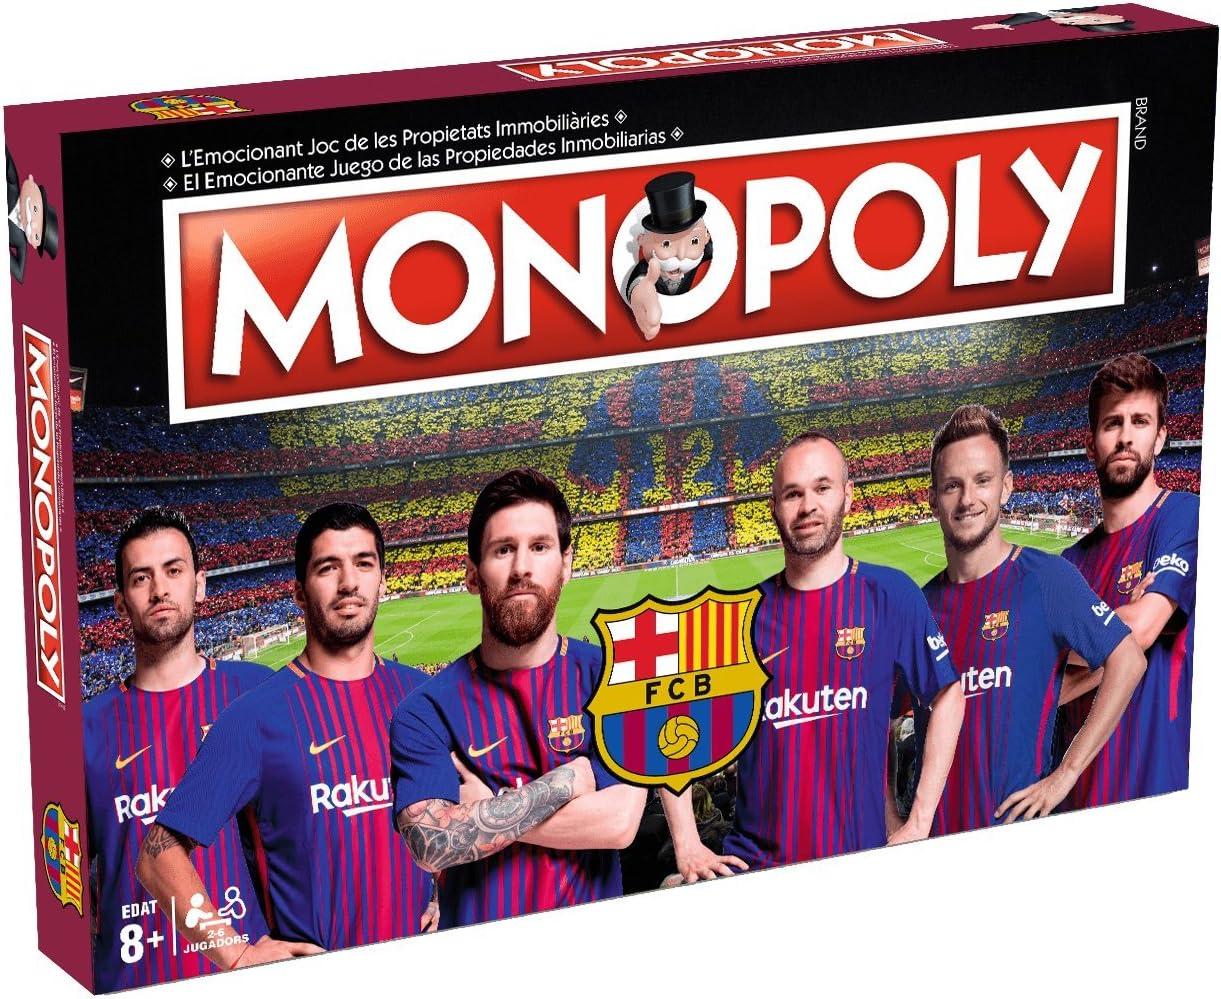 Eleven Force Monopoly F.C. Barcelona 40x26 - + 8años